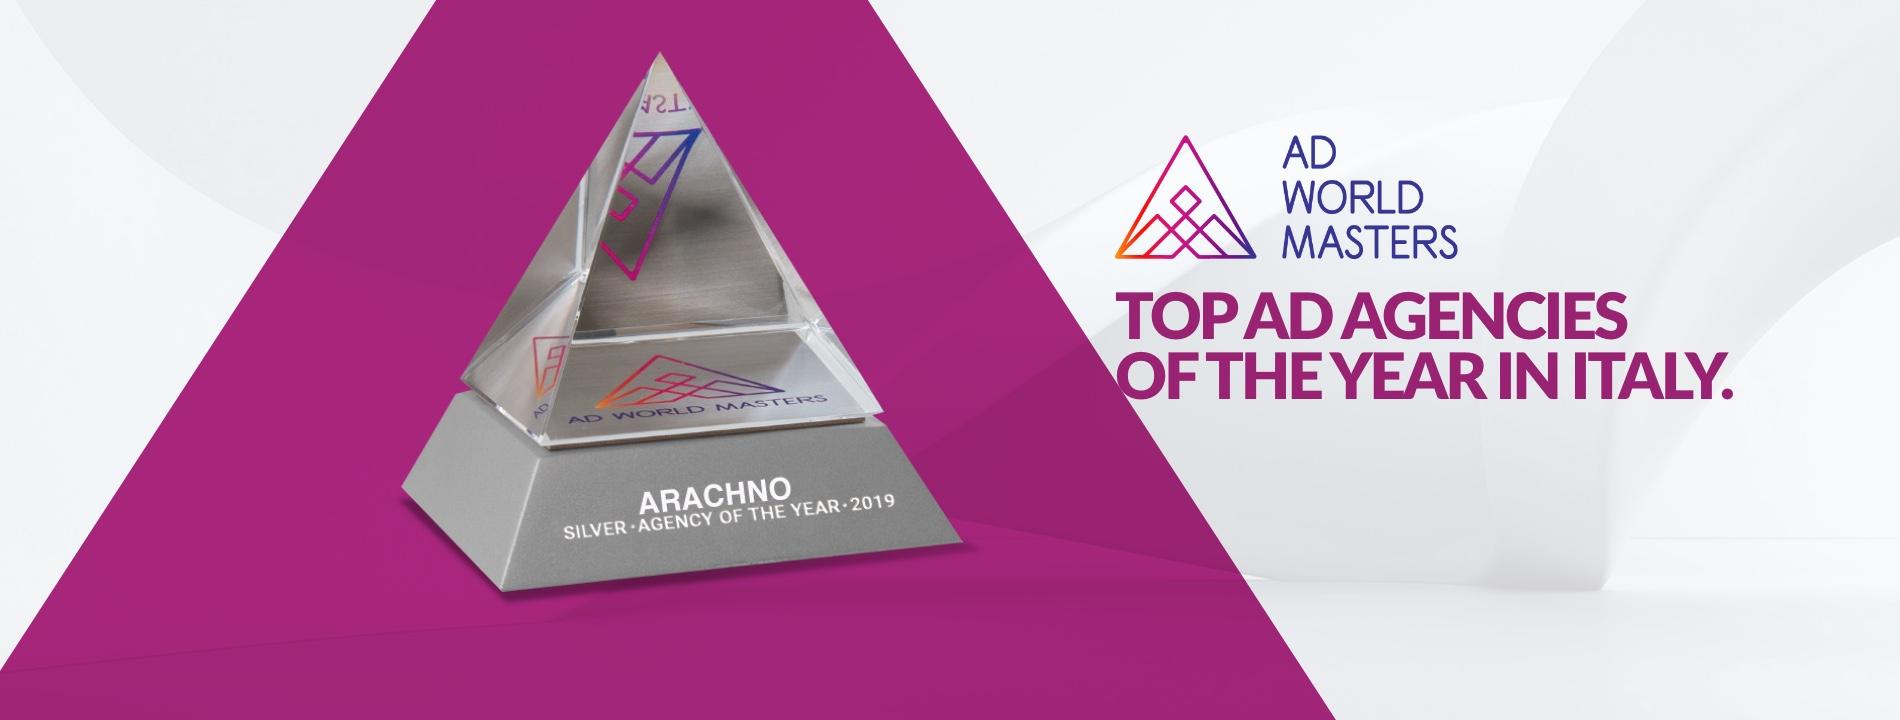 Arachno - Award Top AD Agencies of the Year in Italy